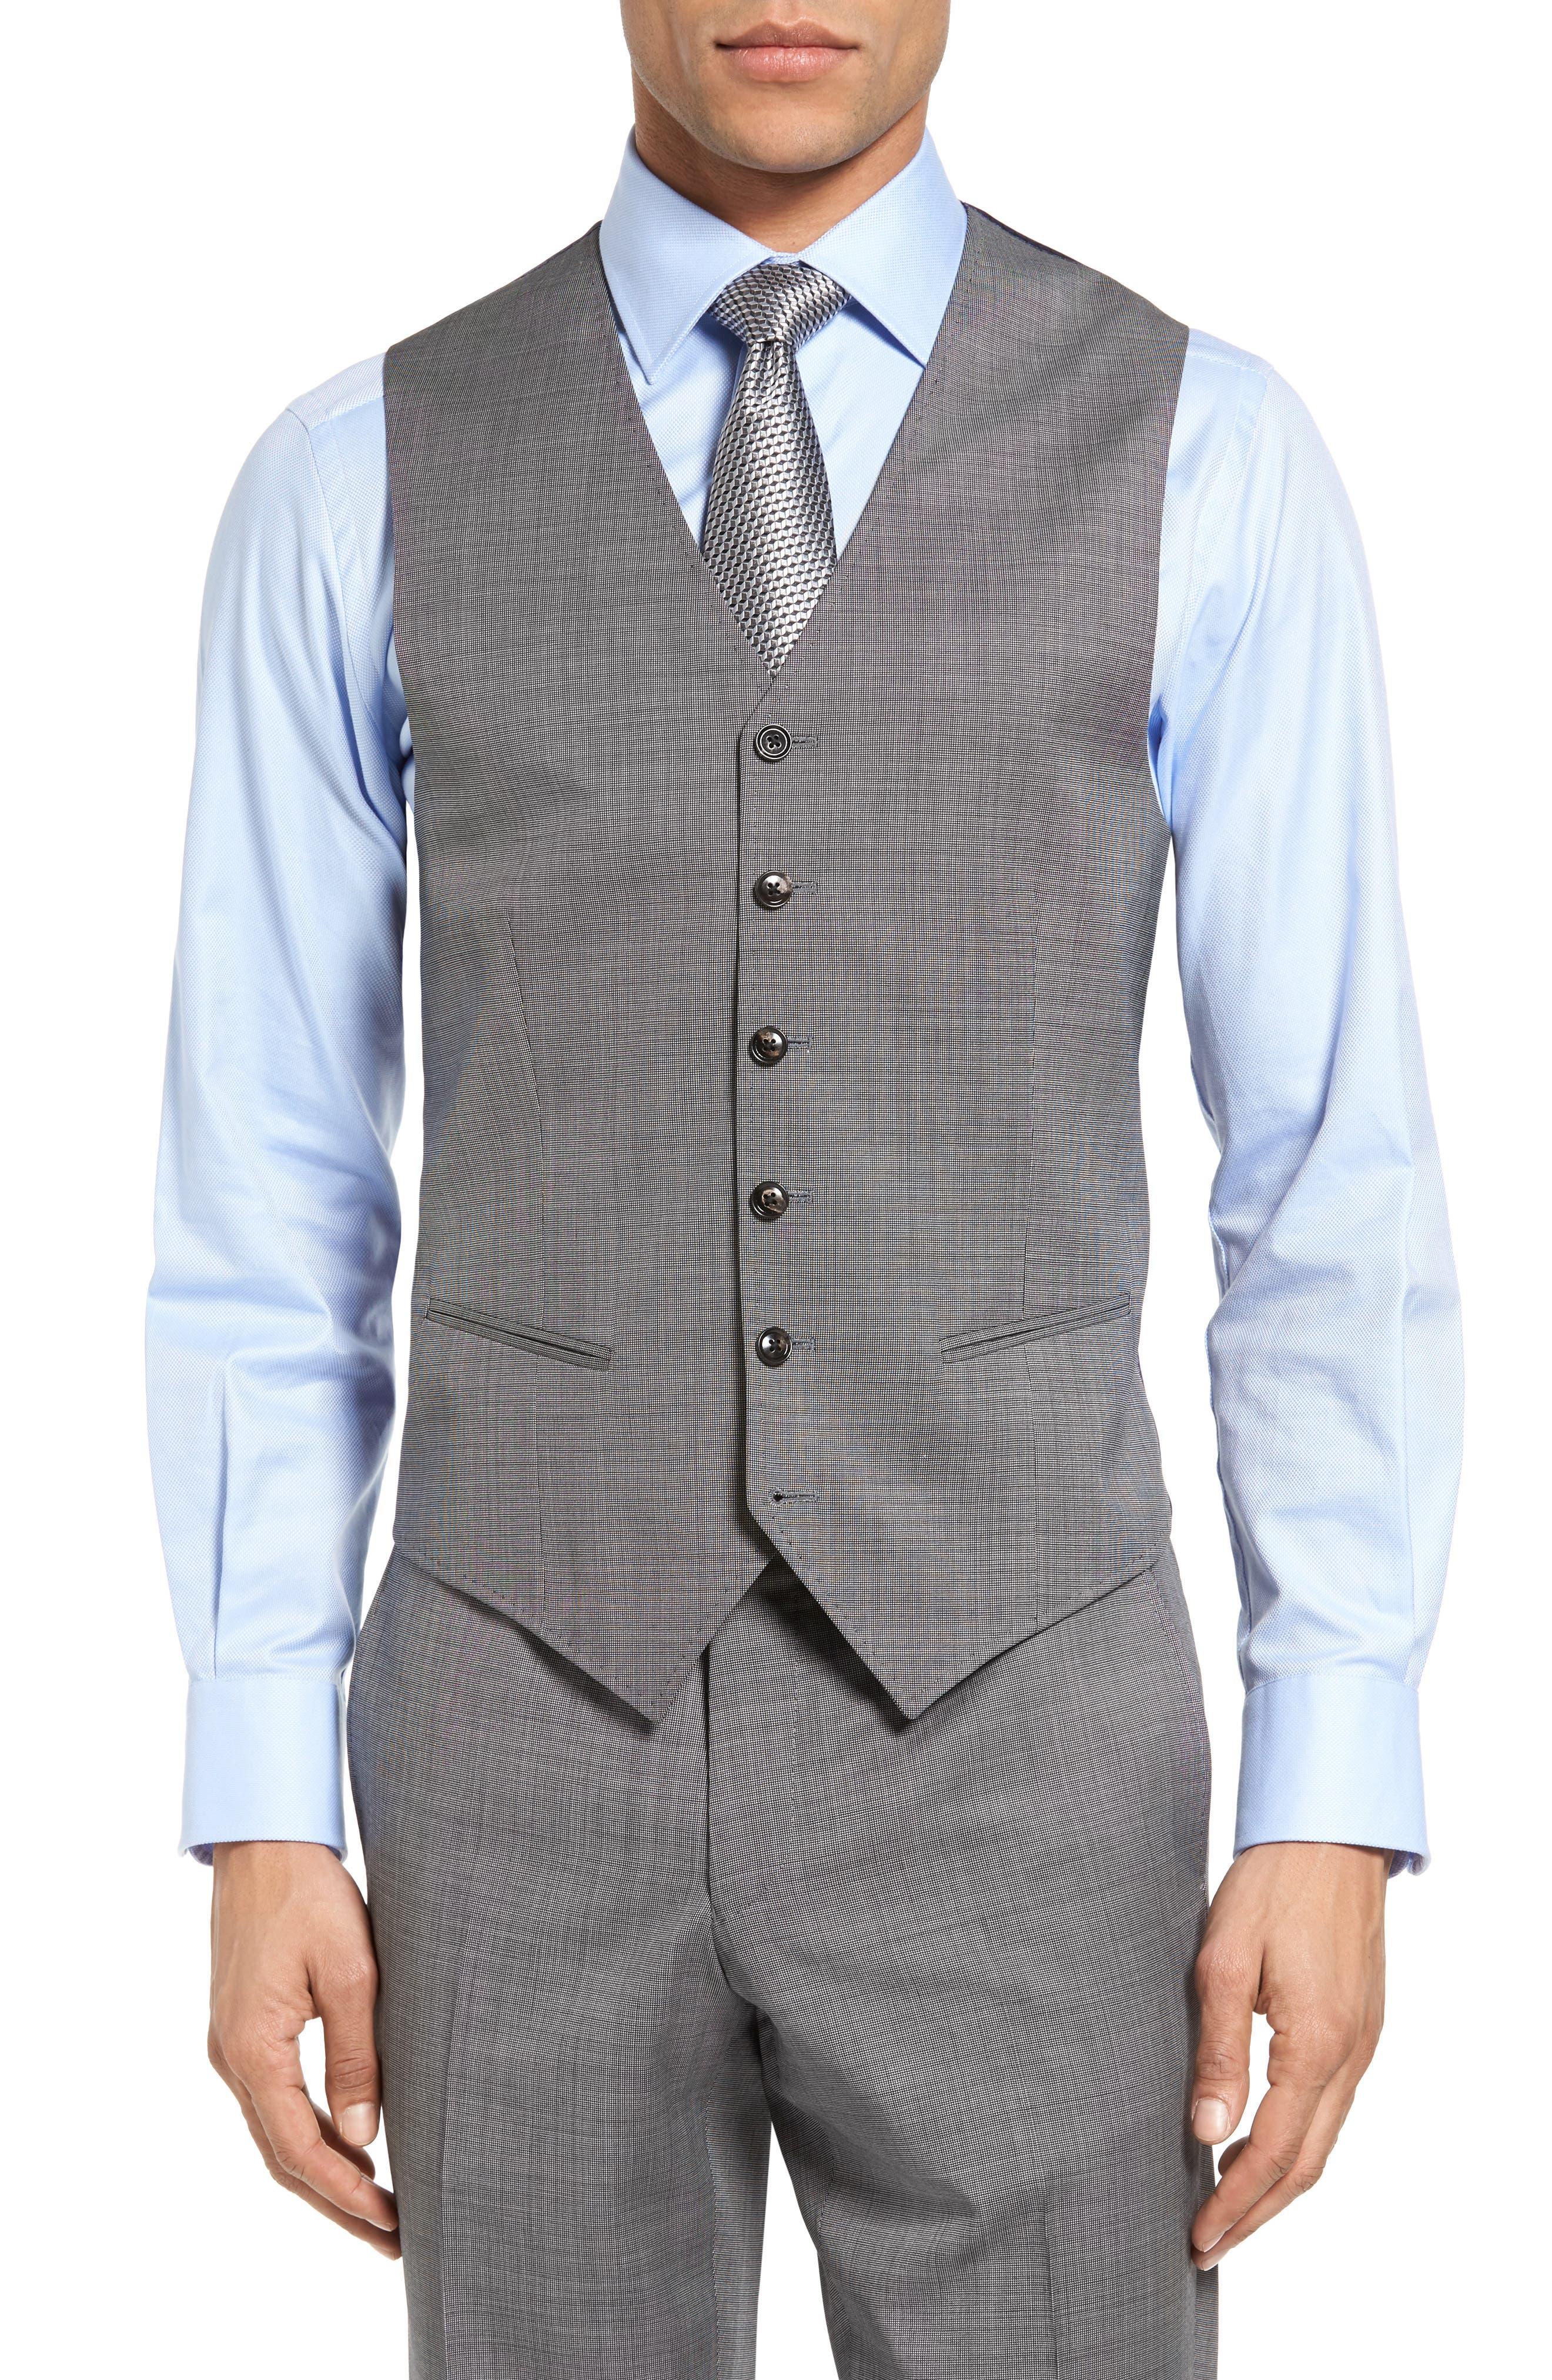 Main Image - Ted Baker London Jones Trim Fit Wool Vest